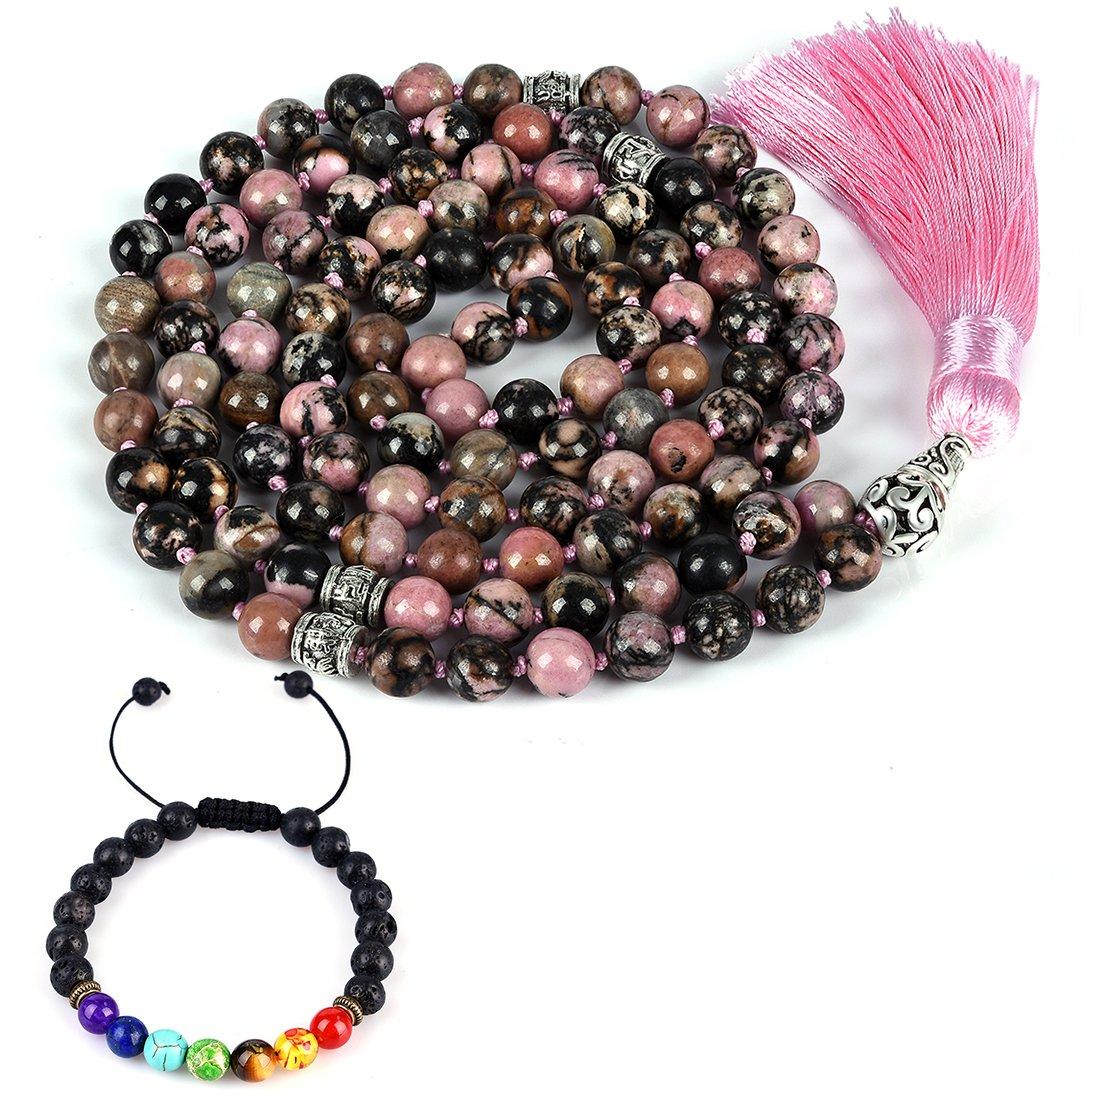 CAT EYE JEWELS 8mm Mala Beads Necklace Yoga Meditation 108 Hand Knotted Rhodonite Japa Mala Buddhist Prayer Beads Tassel Necklace Healing Lava Rock Beads Diffuser Bracelet